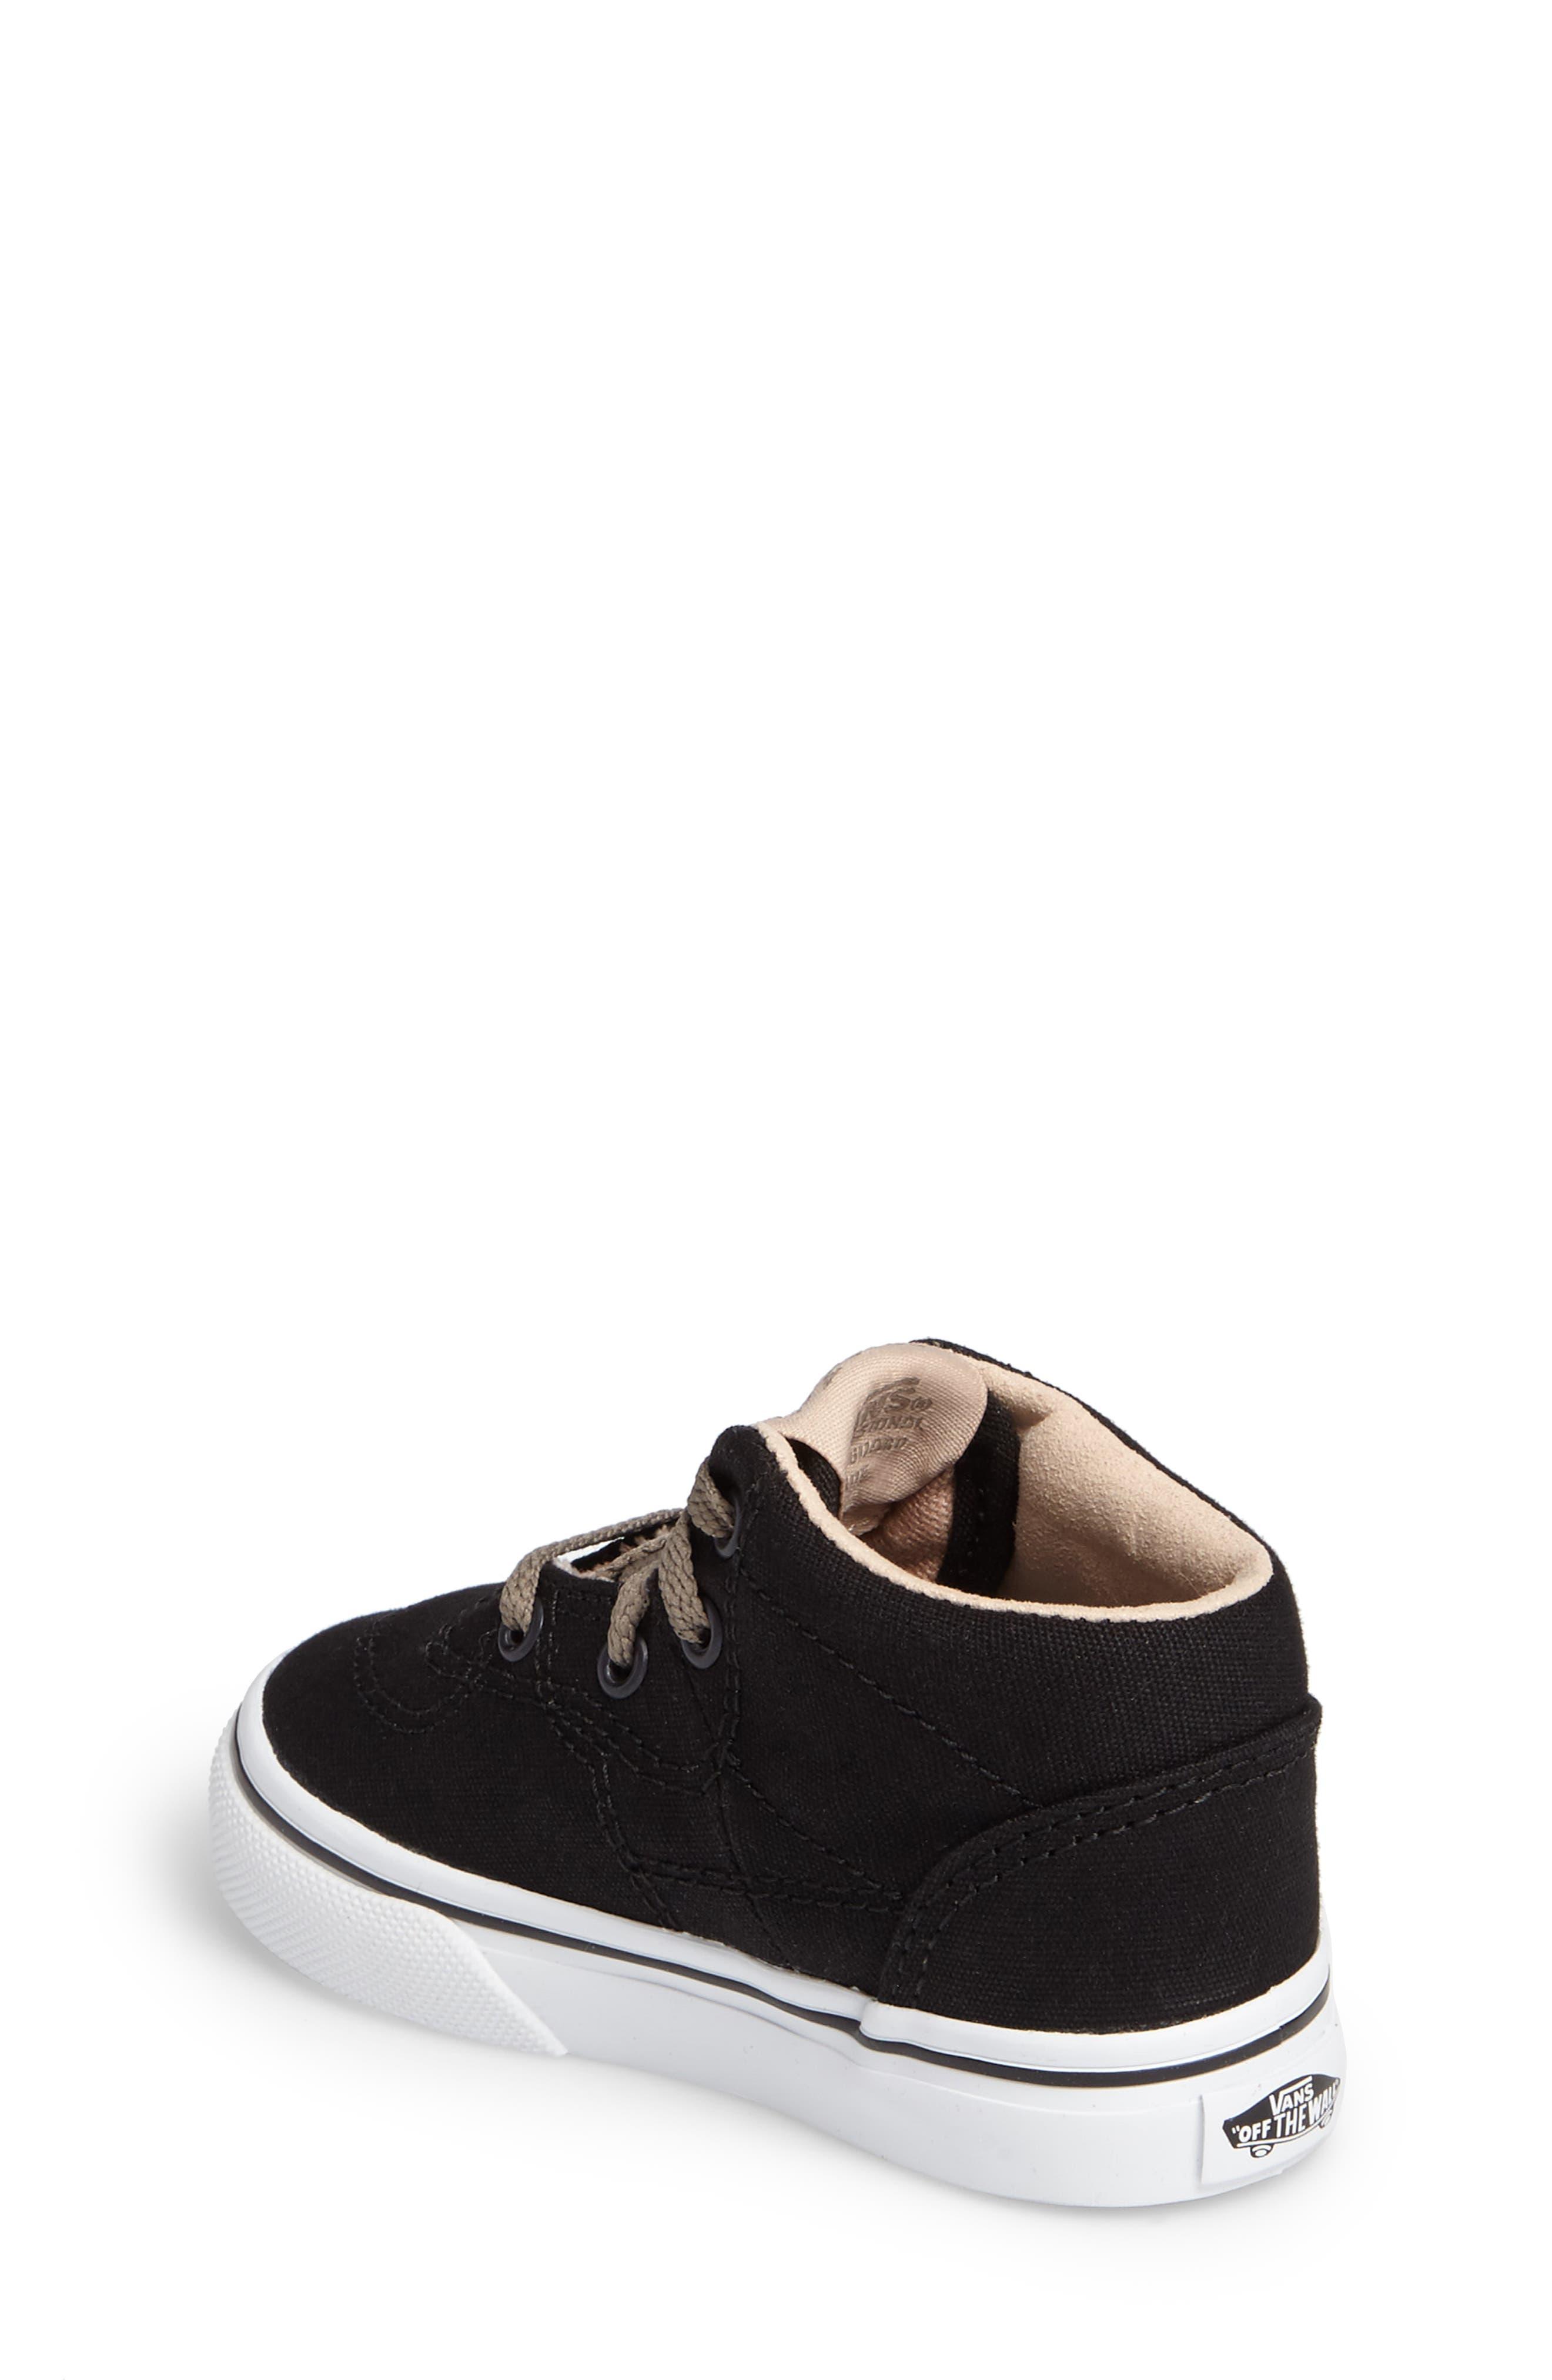 Alternate Image 2  - Vans Half Cab Sneaker (Baby, Walker & Toddler)